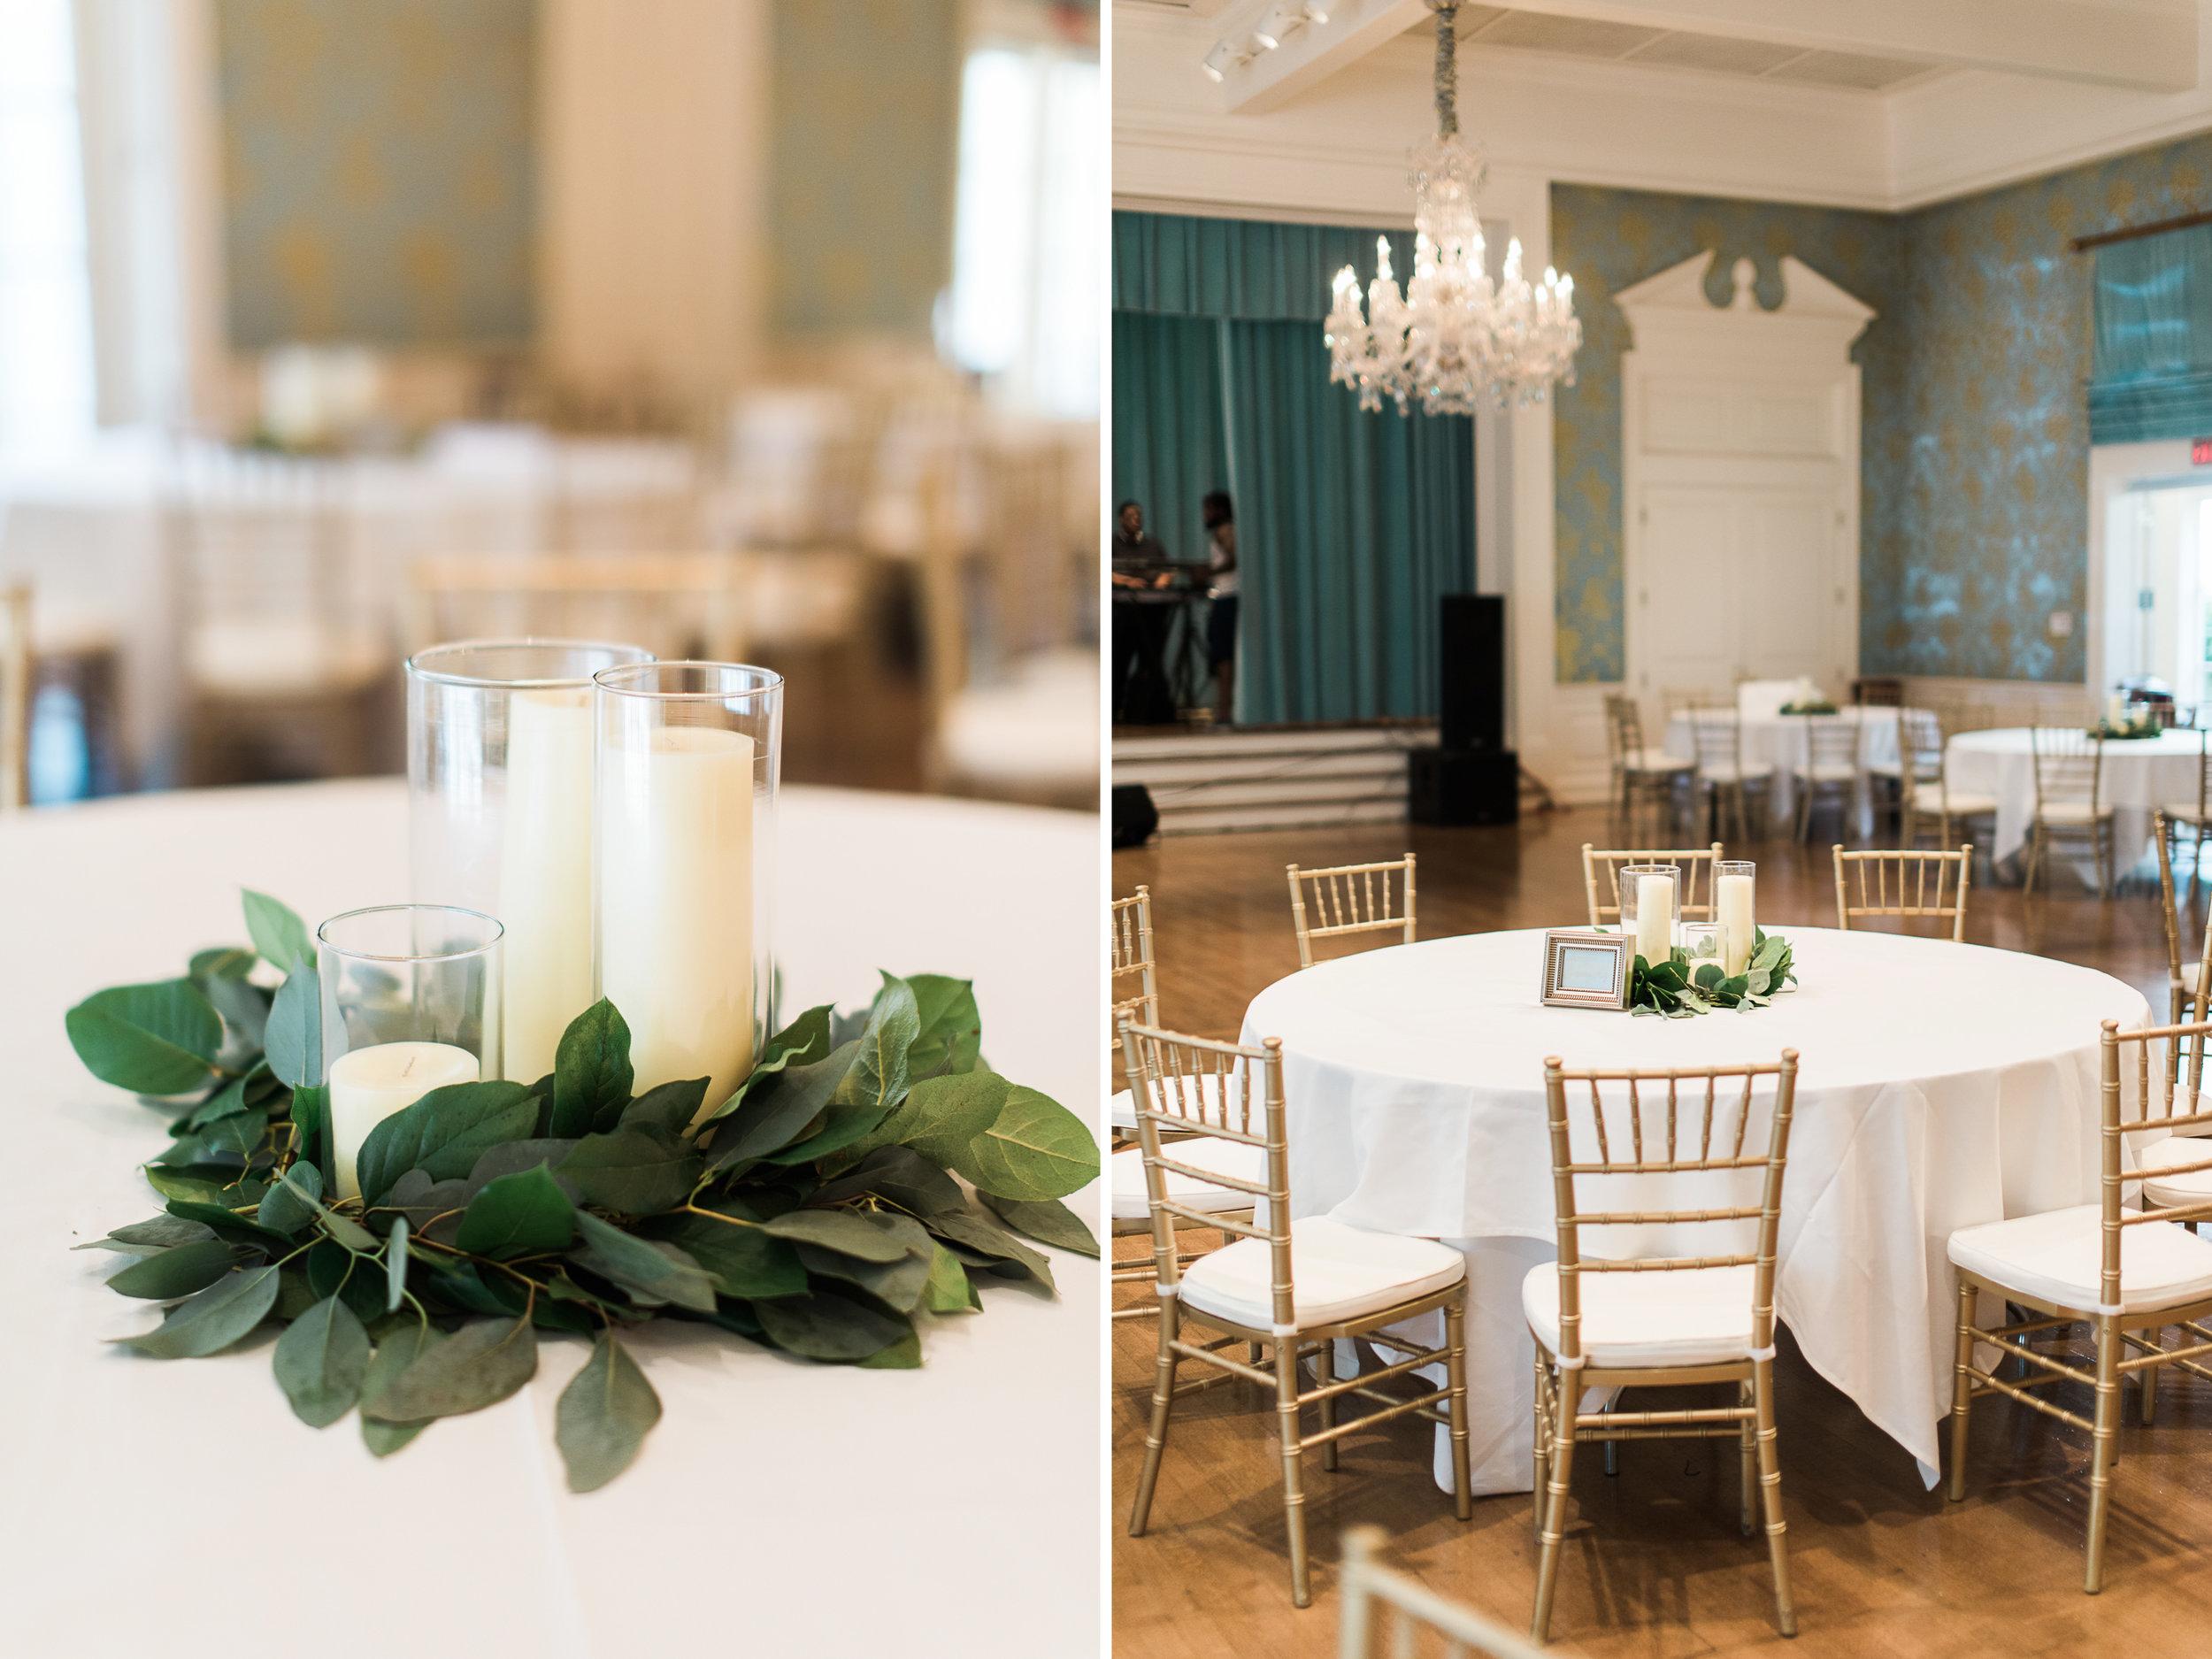 St.-Philip-Presbyterian-Church-Houston-Wedding-Ceremony-The-Junior-League-Of-Houston-Reception-Dana-Fernandez-Photography-Fine-Art-Film-141.jpg